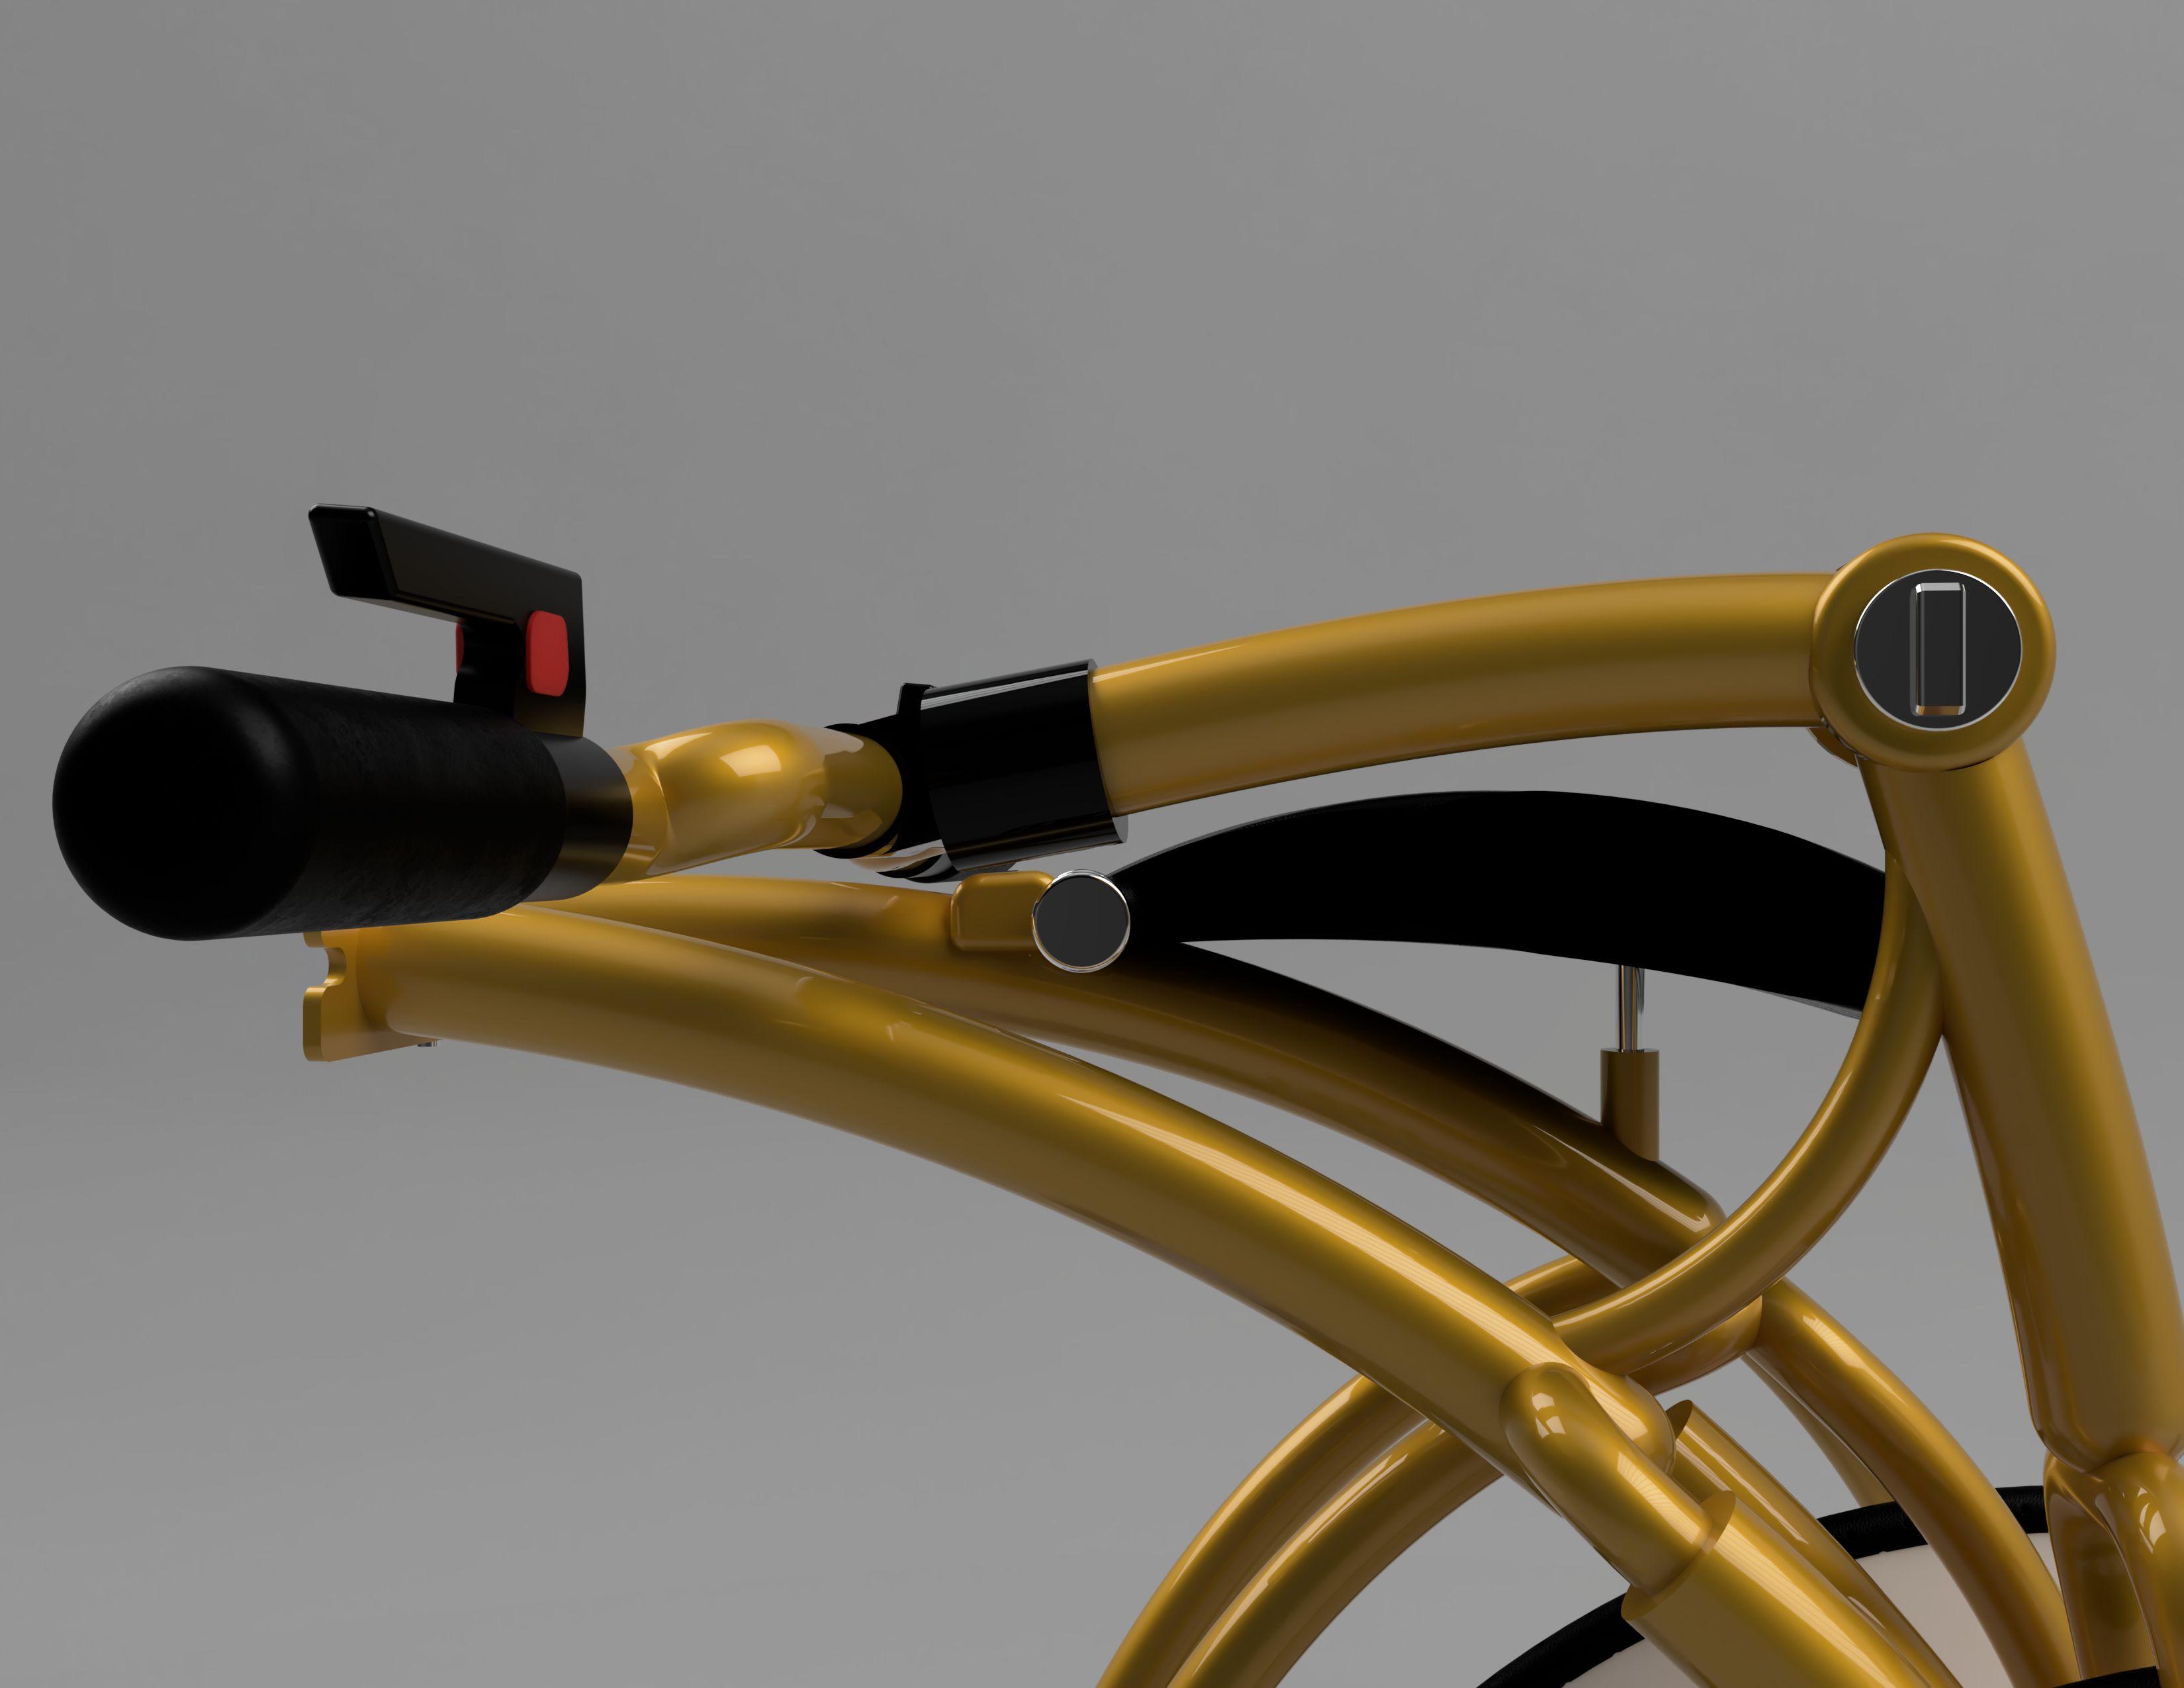 Diana--bici-ddd-2020-mar-14-12-40-17am-000-customizedview18554155782-png-3500-3500